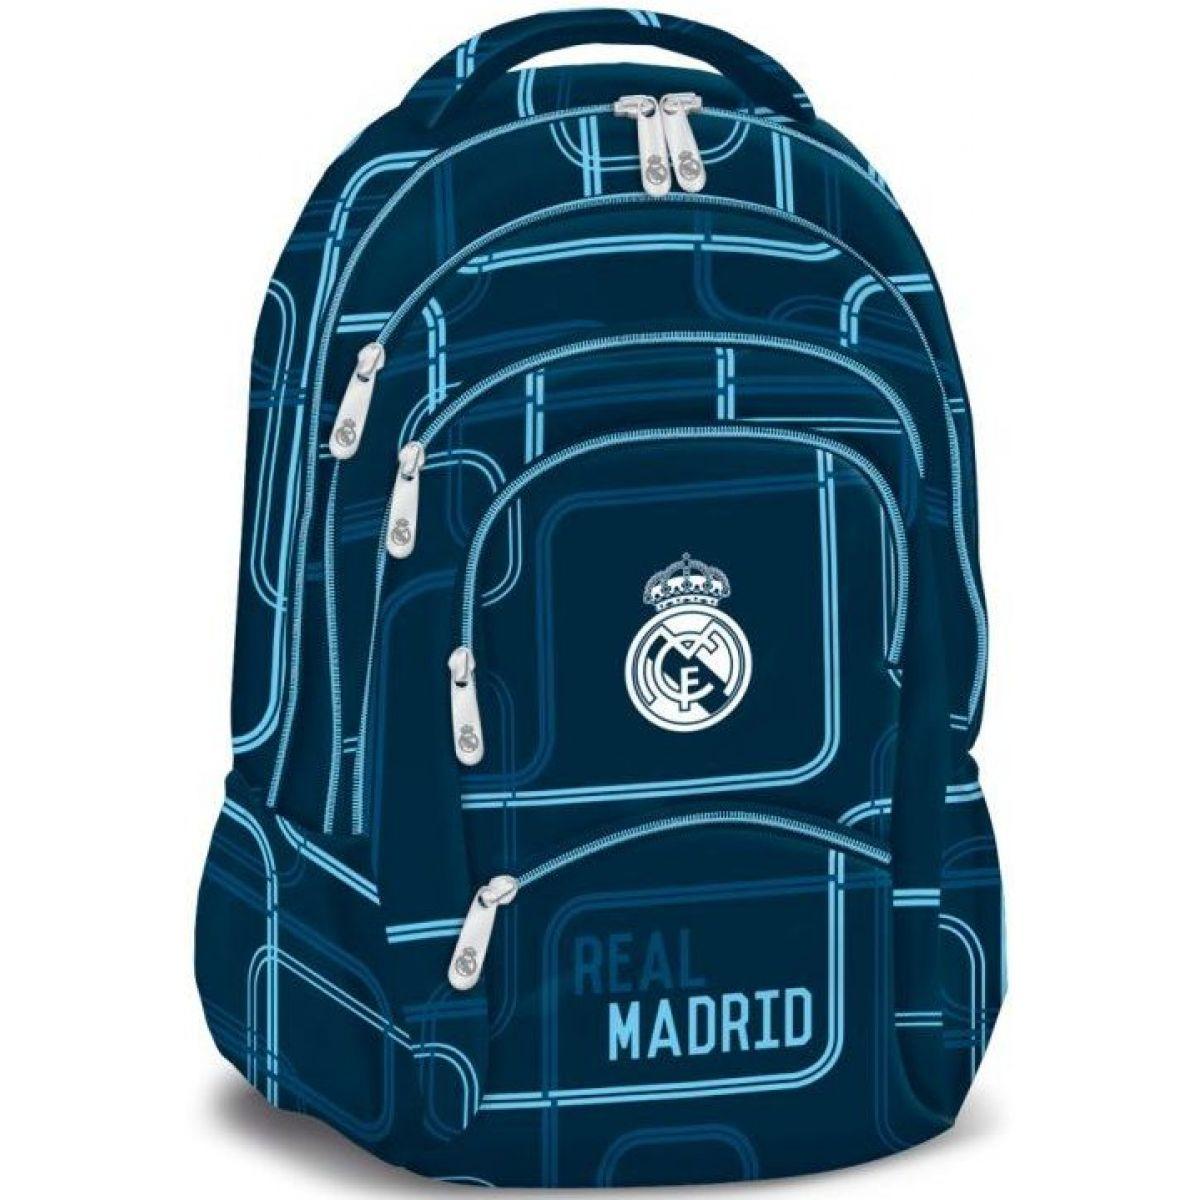 Ars Una Školní batoh Real Madrid 2017